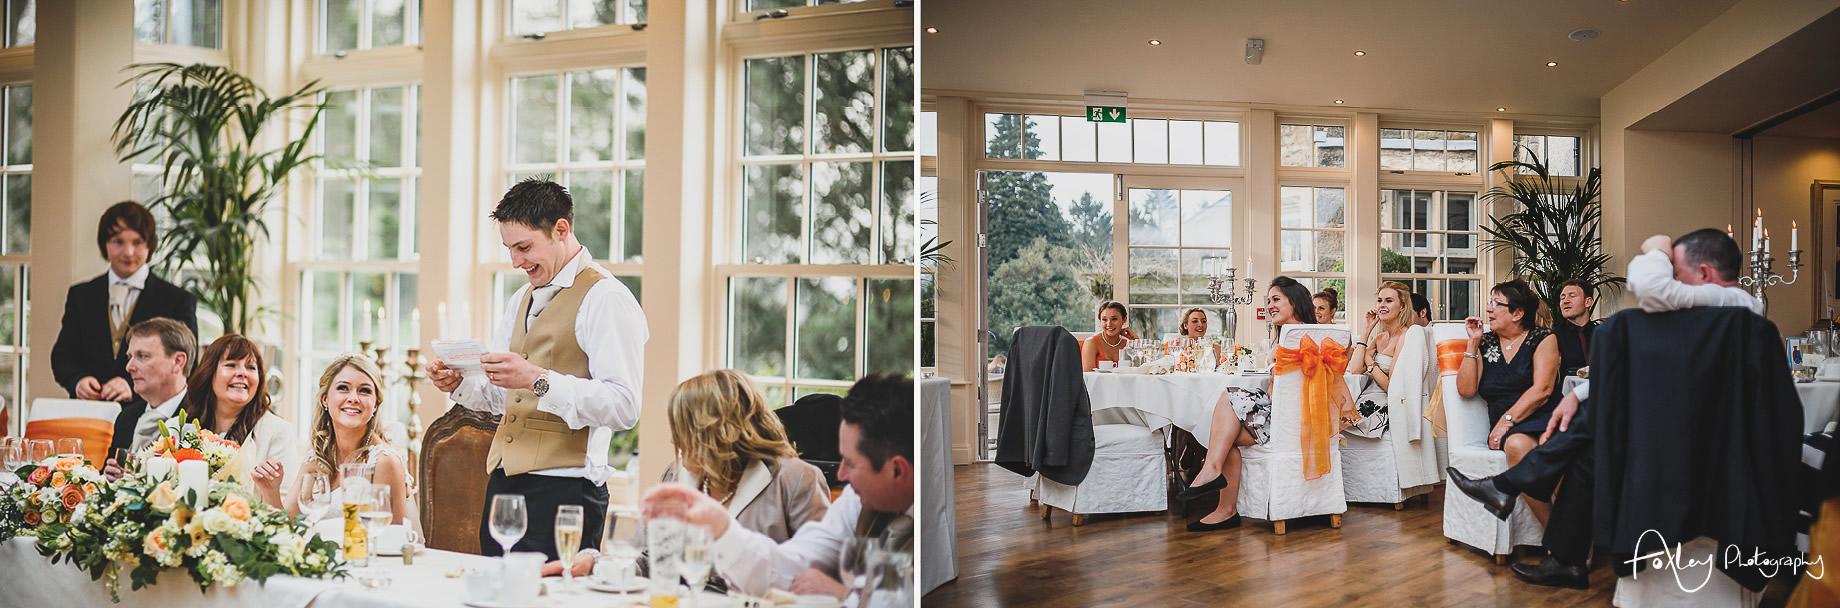 Gemma and Lewis' Wedding at Mitton Hall 131